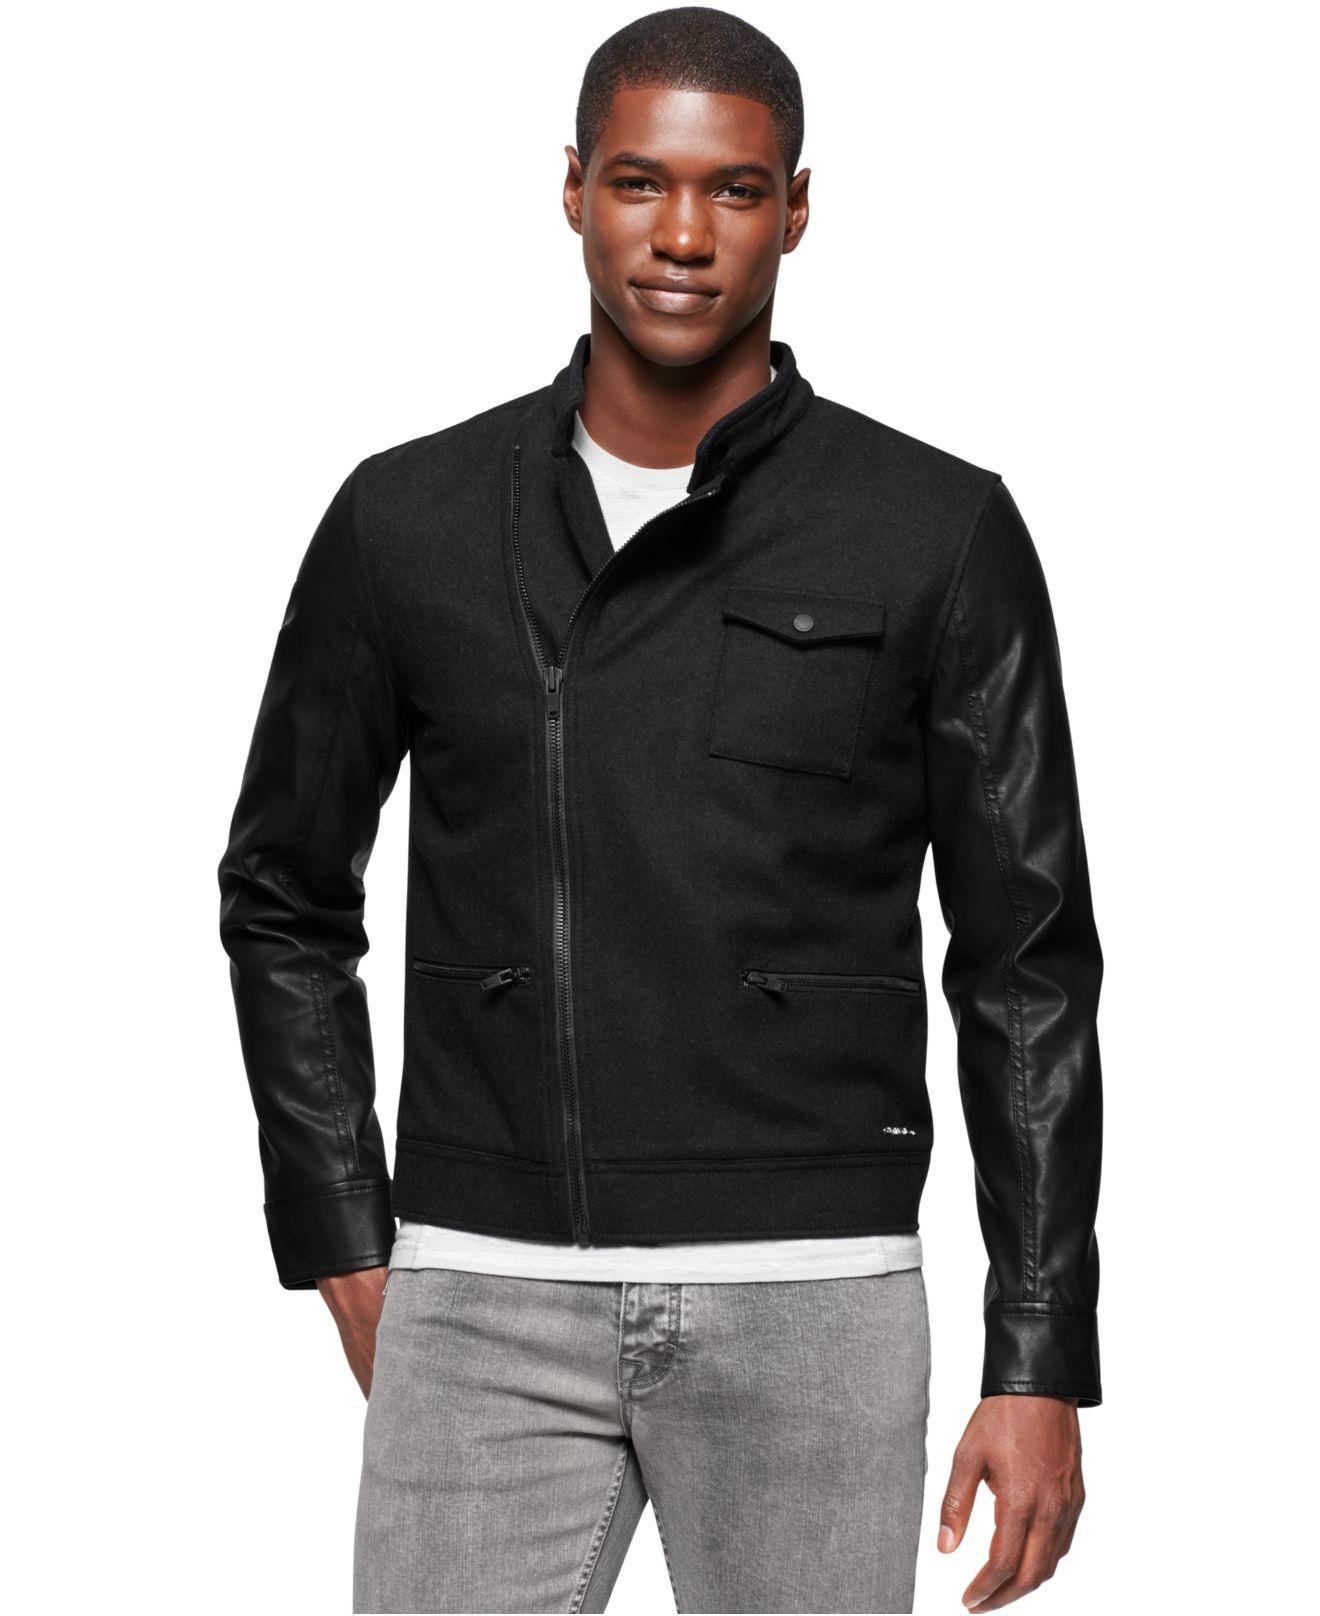 Lyst - Calvin Klein Jeans Short Military Biker Jacket in Black for Men